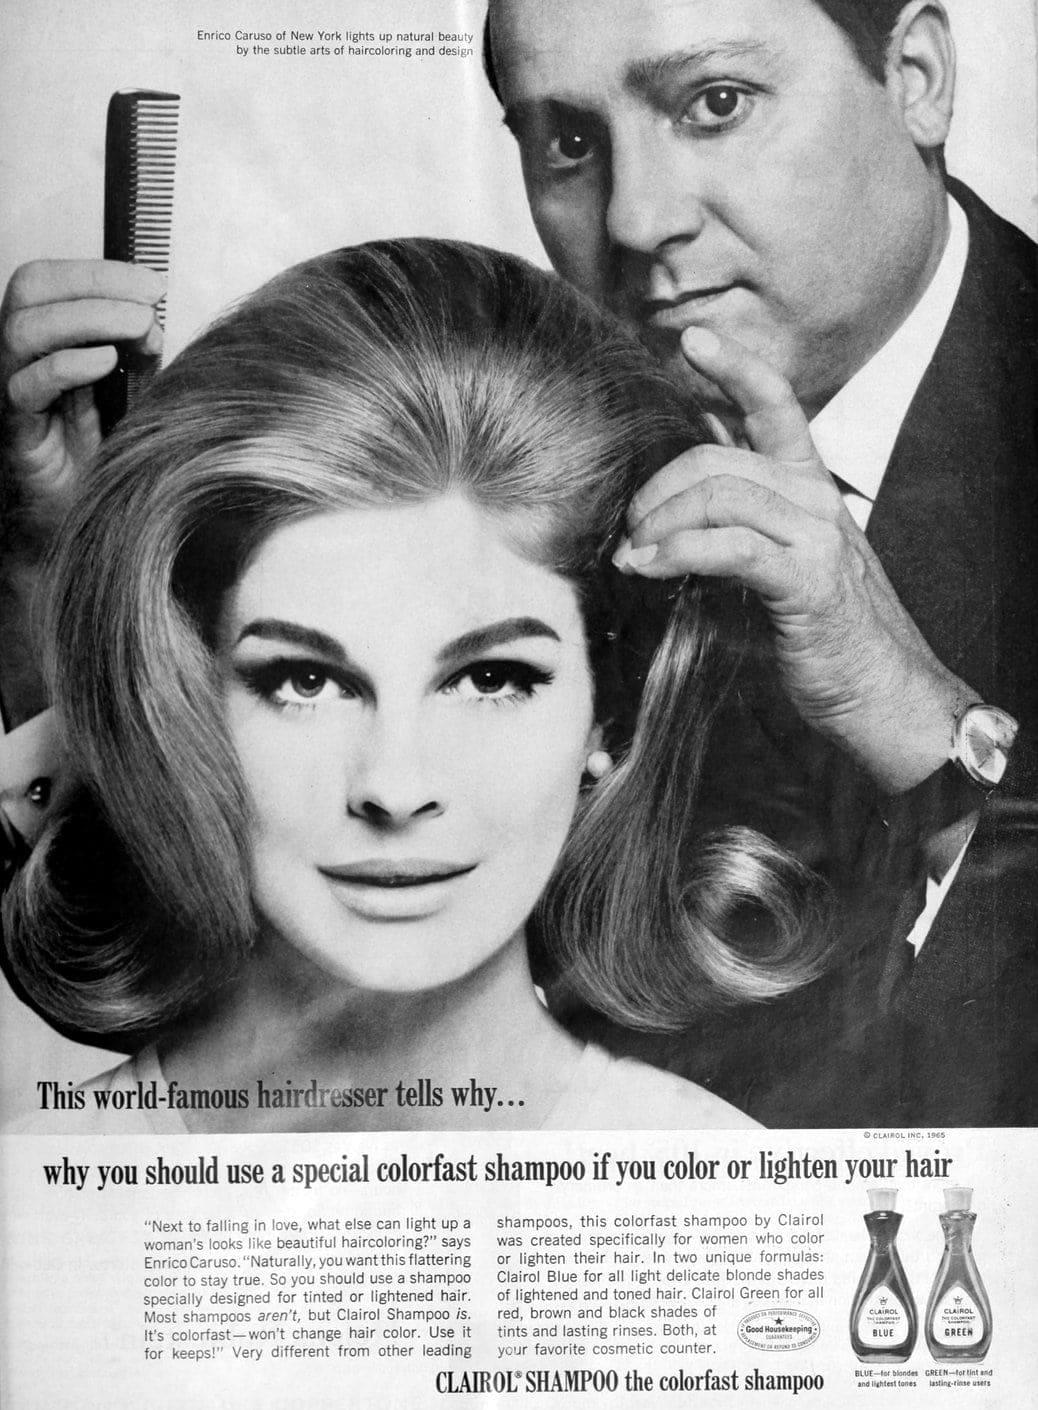 Vintage Candice Bergen for Clairol Shampoo (1965)